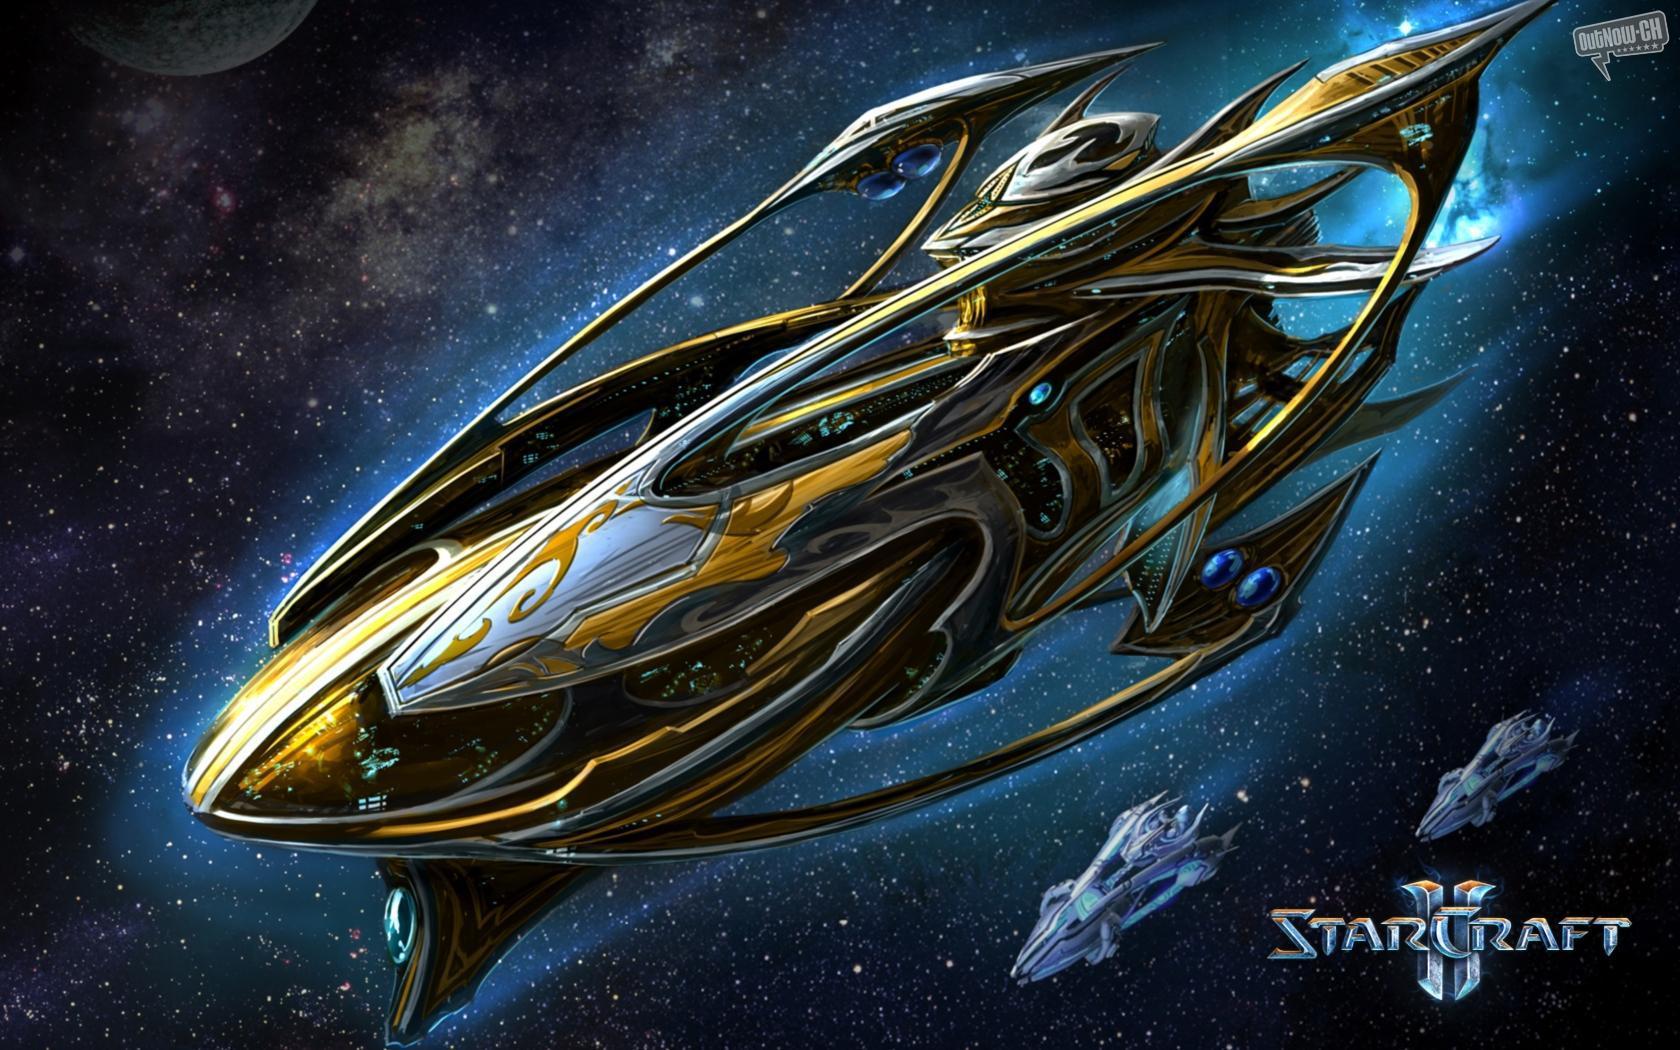 Starcraft 2 Wallpapers alguno te llevas   Taringa 1680x1050